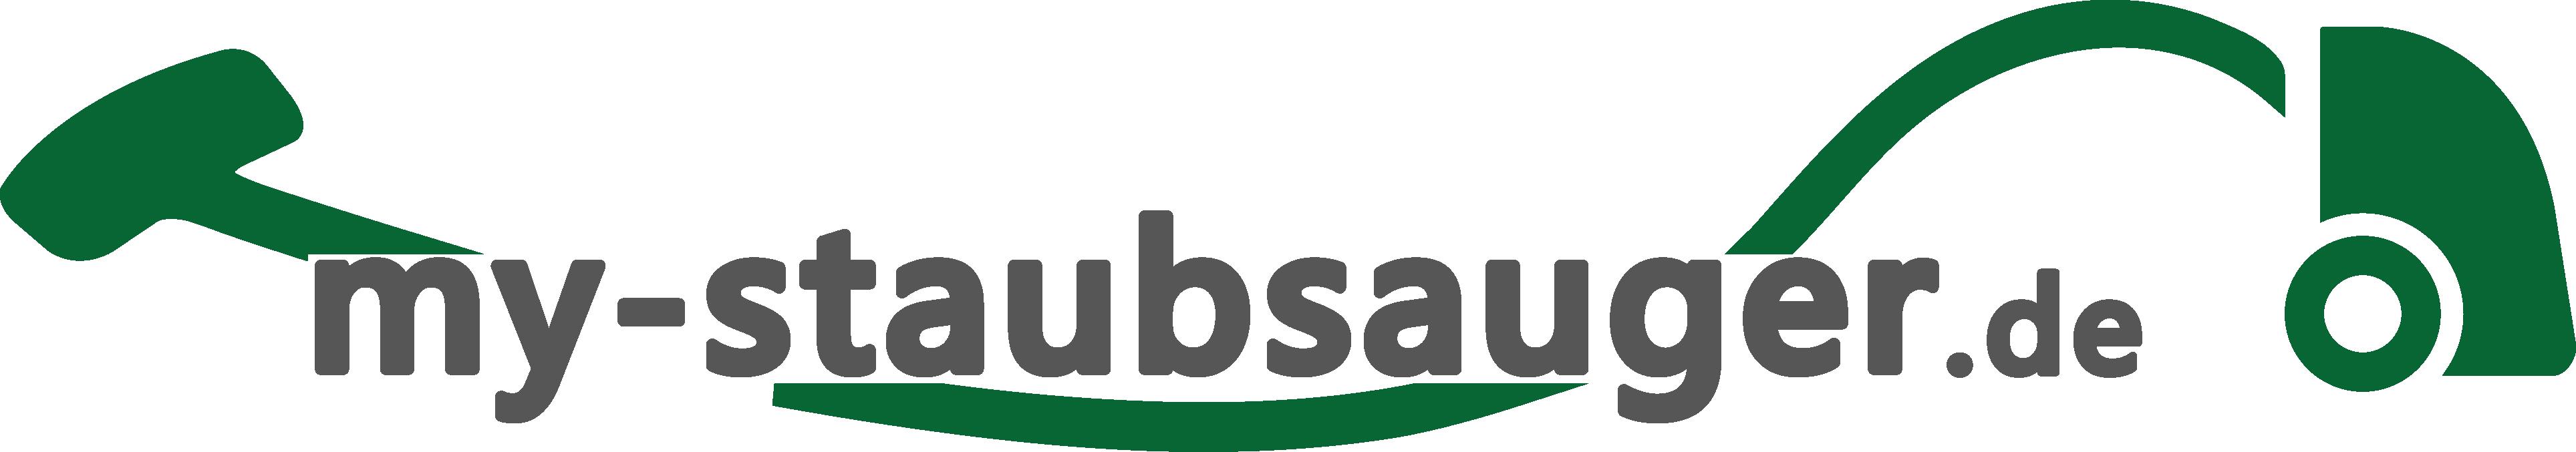 my-staubsauger.de_Logo_Paket